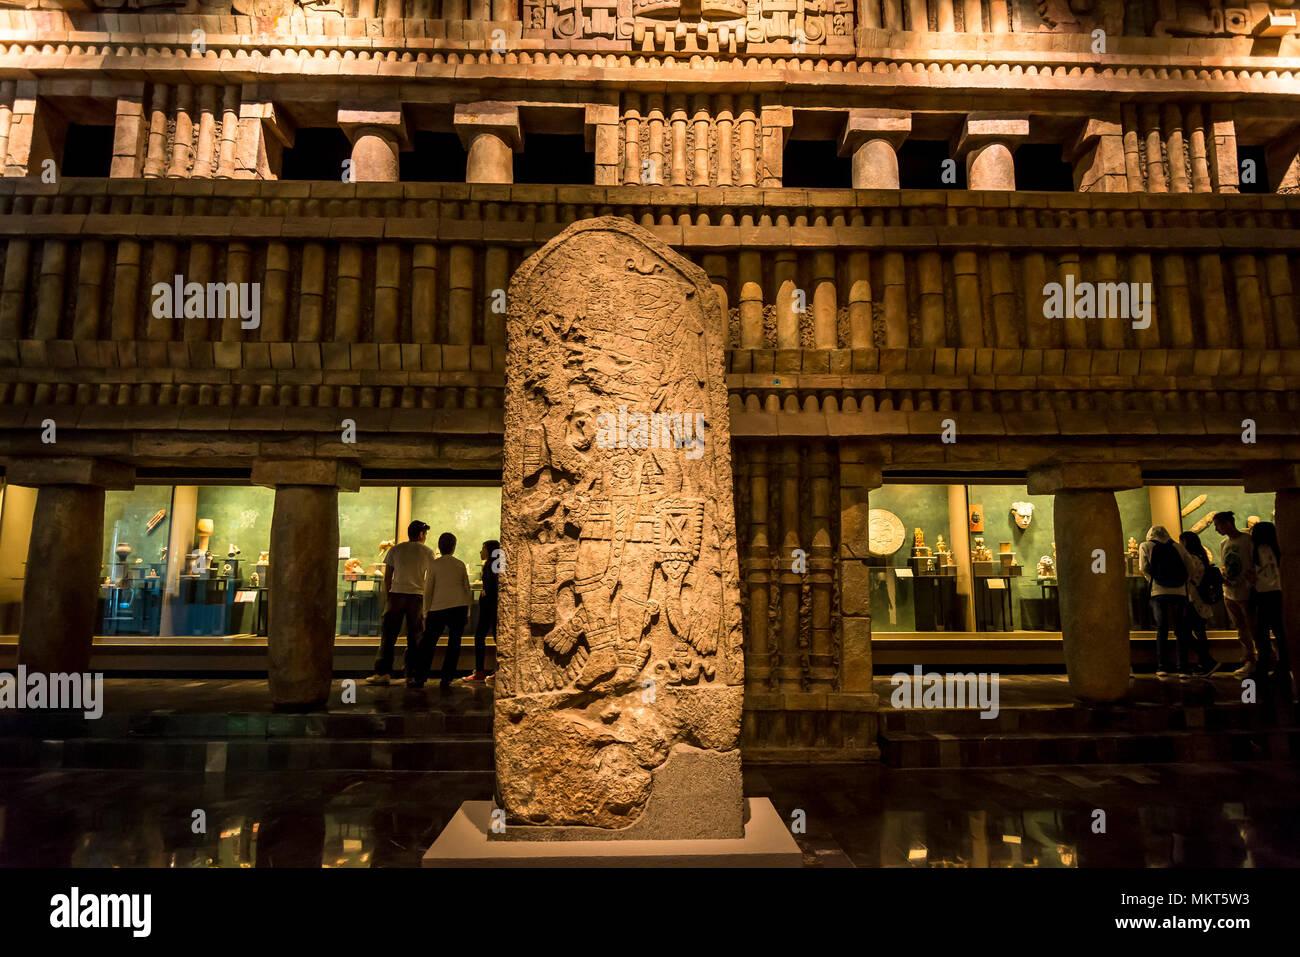 Mayan Room, National Museum of Anthropology, Museo Nacional de Antropología, MNA, Mexico City, Mexico - Stock Image